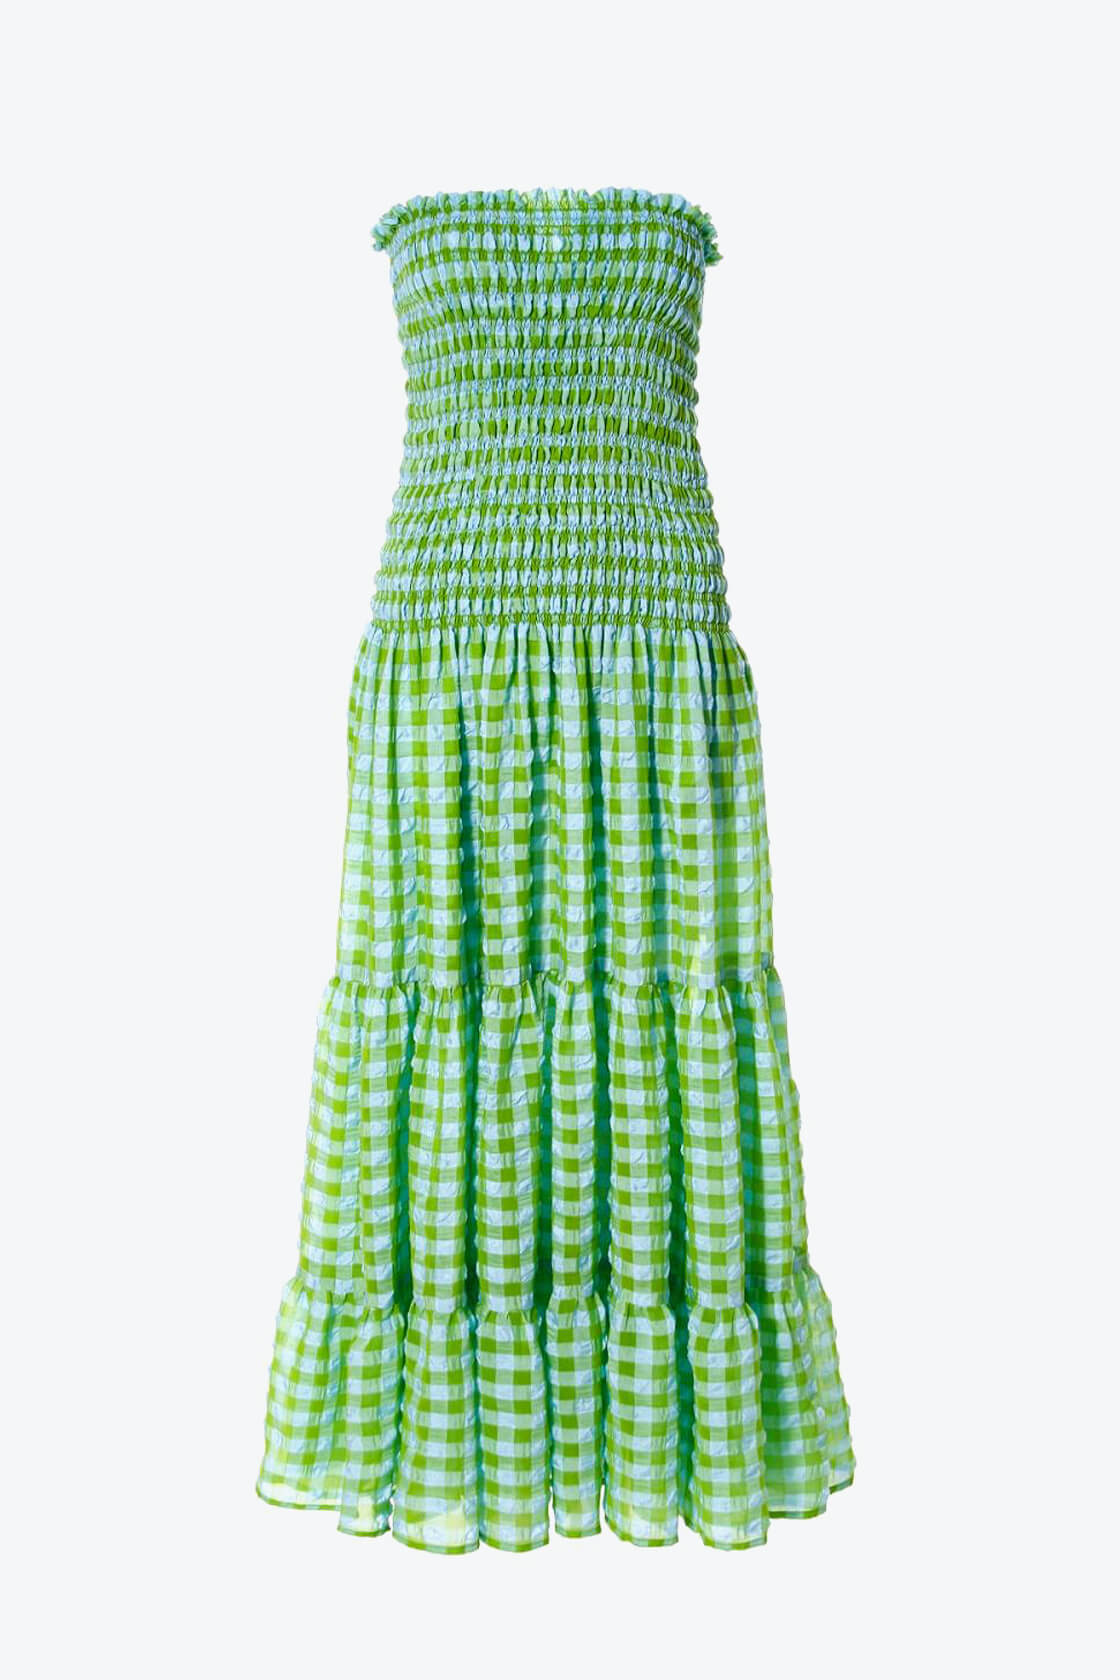 OL100002597 Dress Maya Tender Shoots1